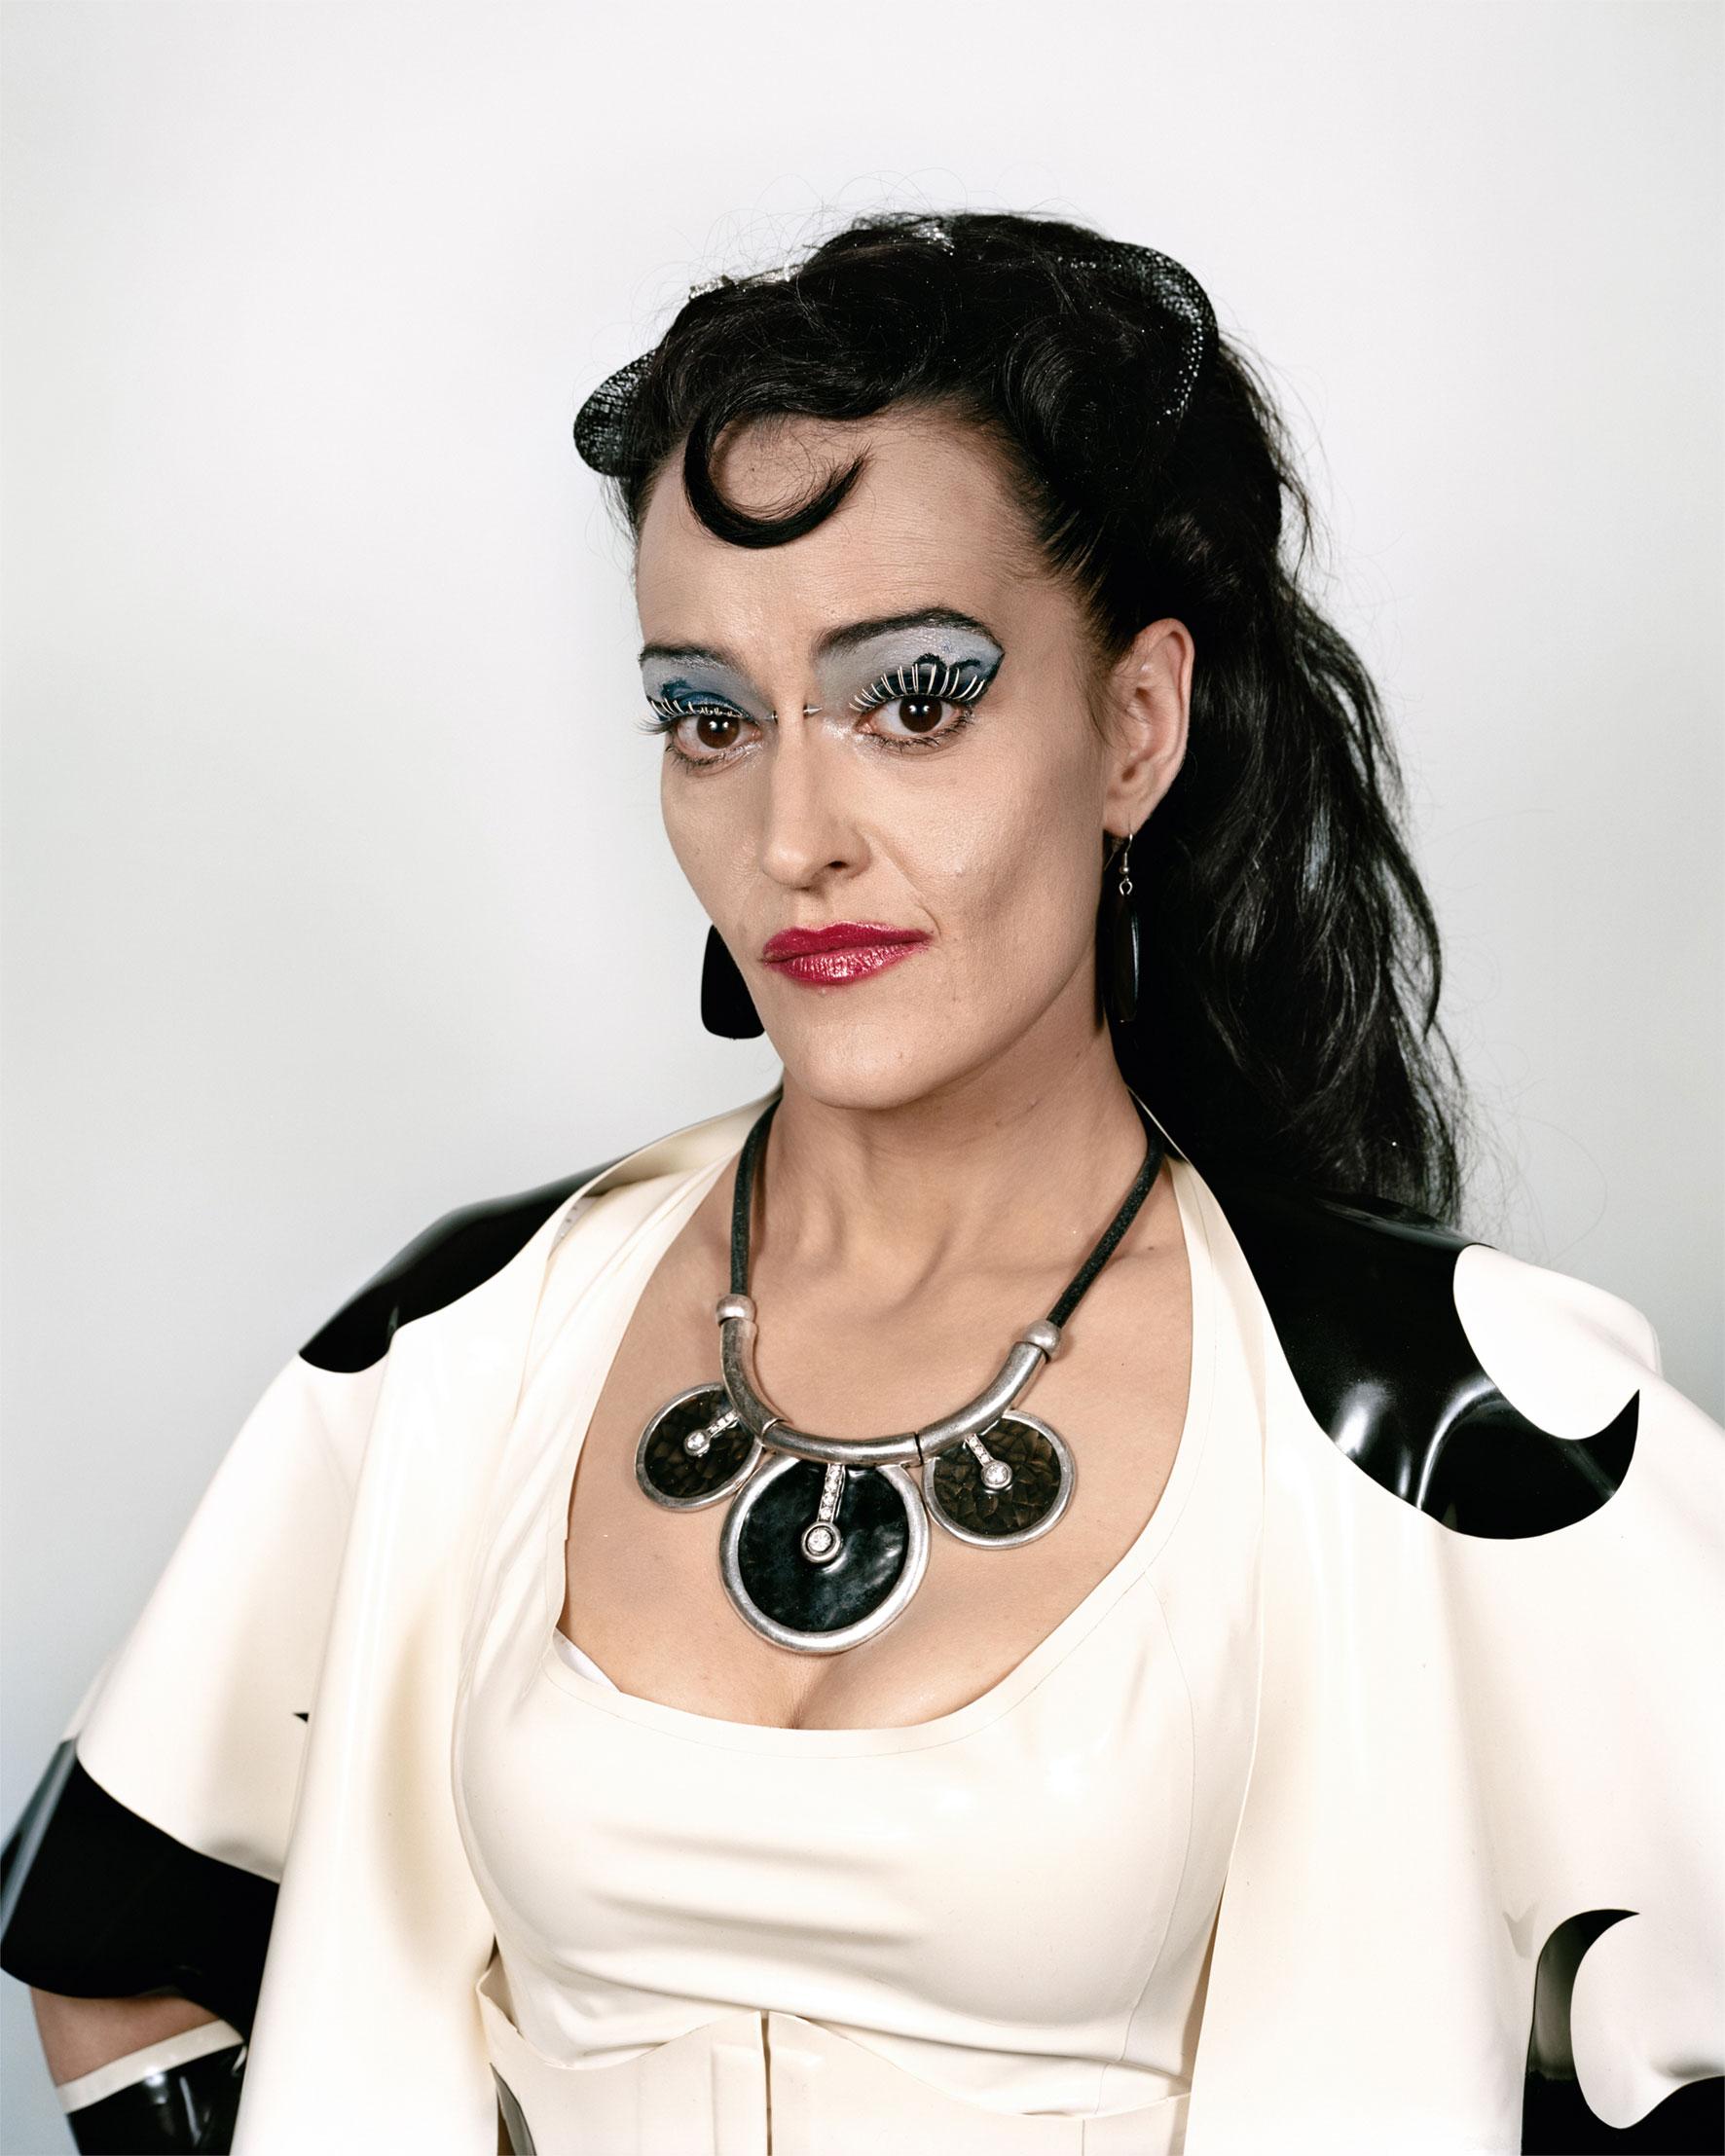 Lady Xara